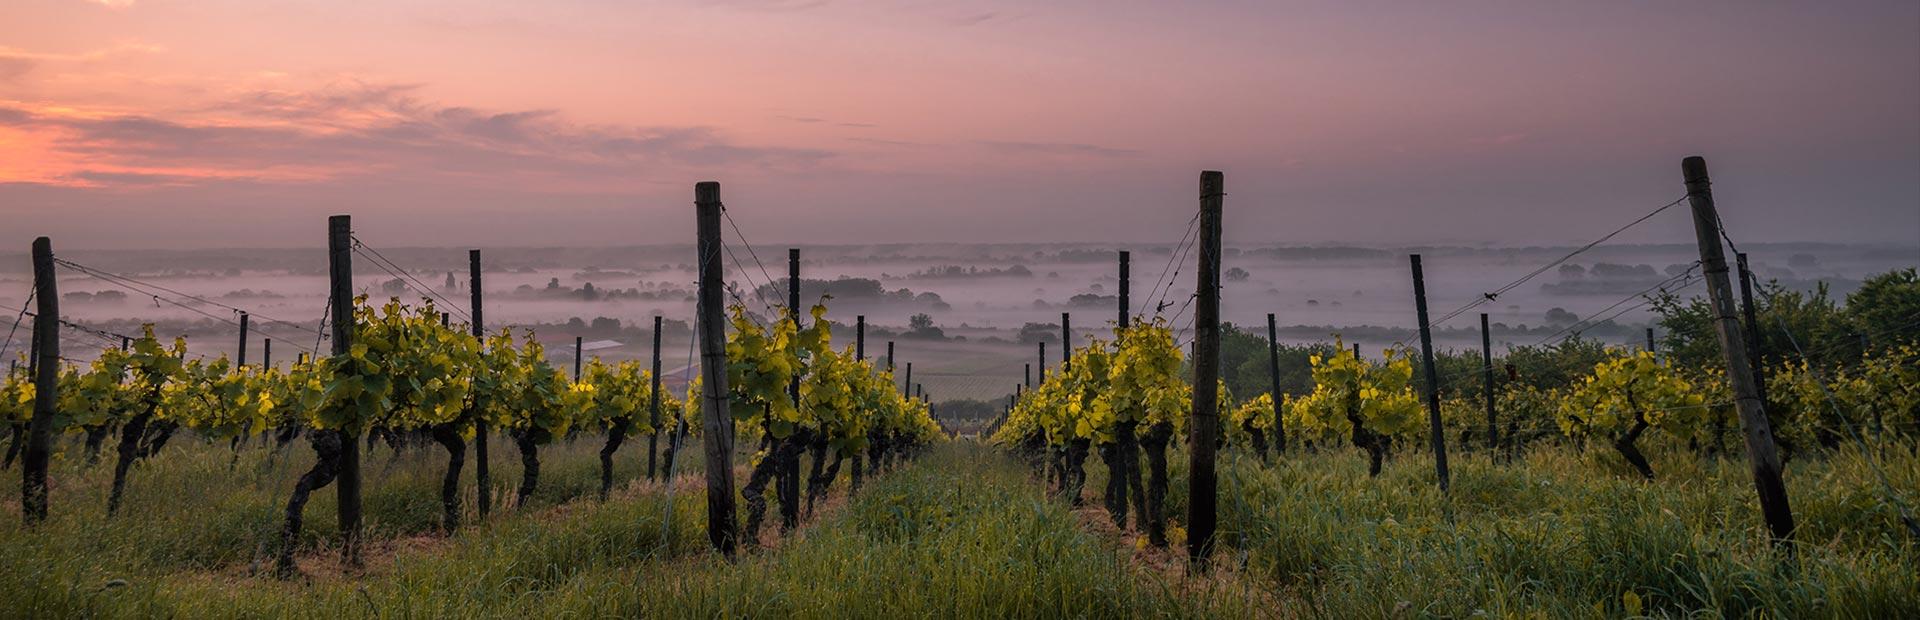 home_wine2_portfoliodetails3